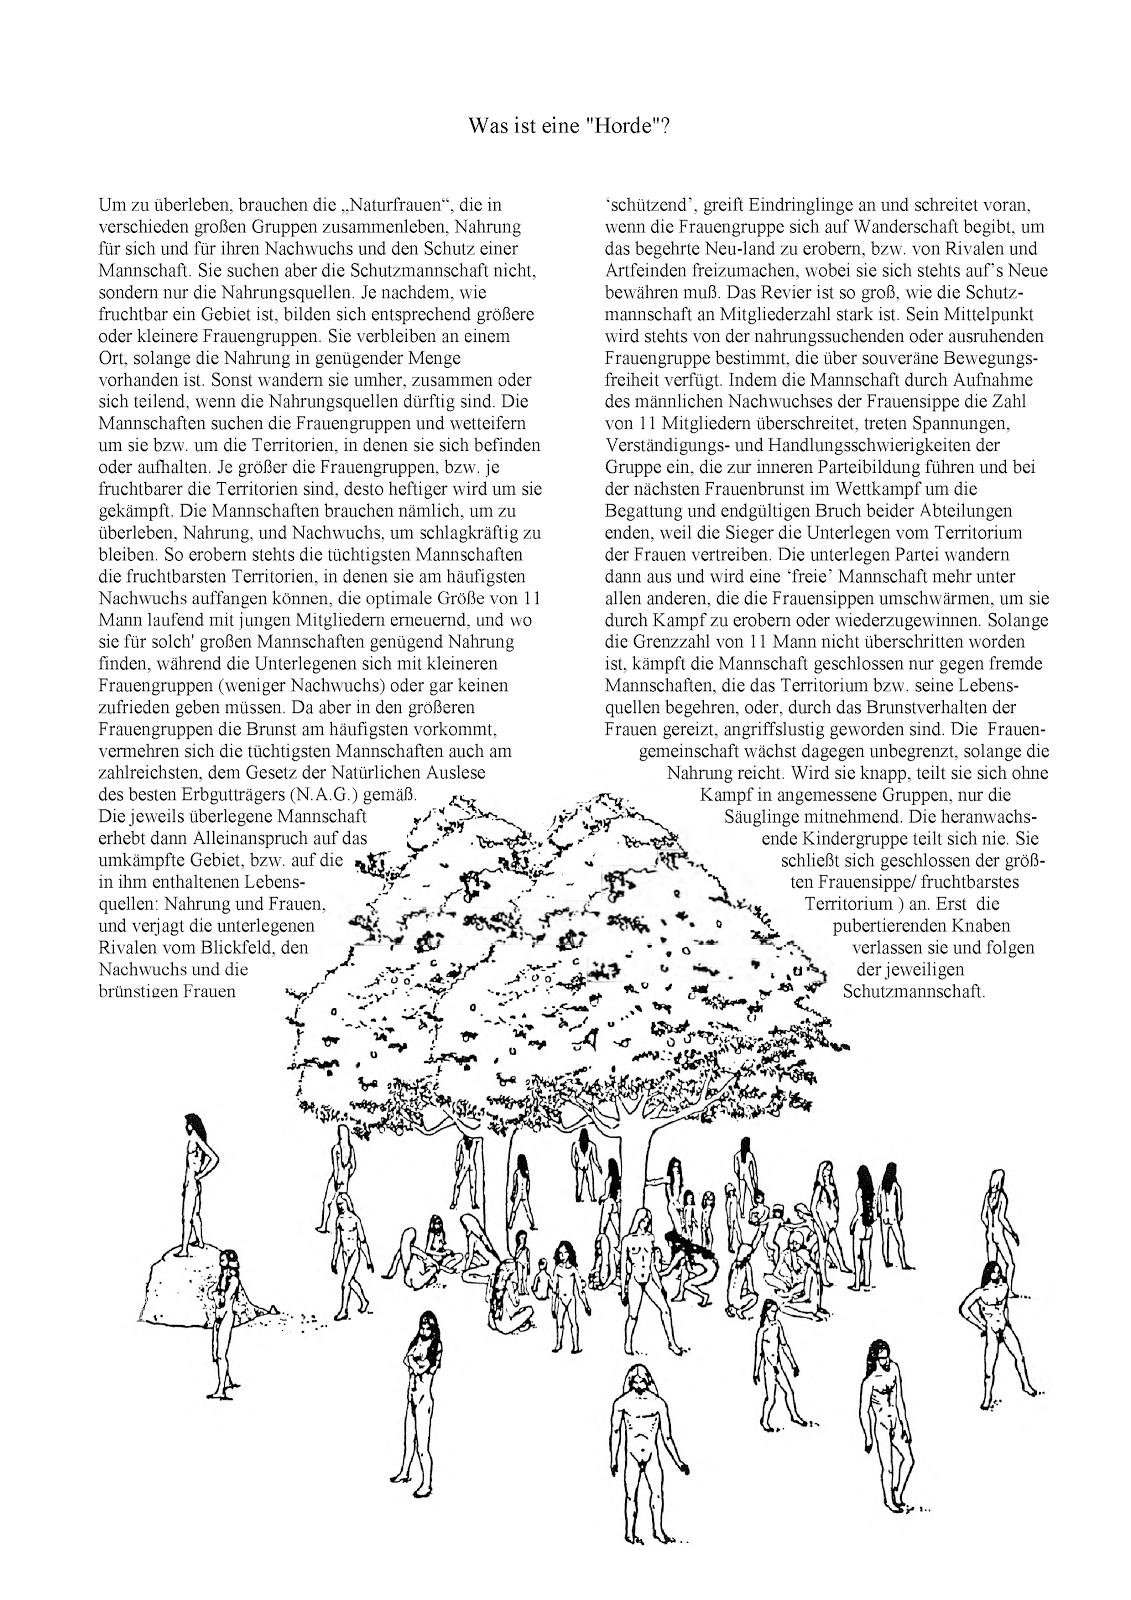 Das ethologische Hordenmodell